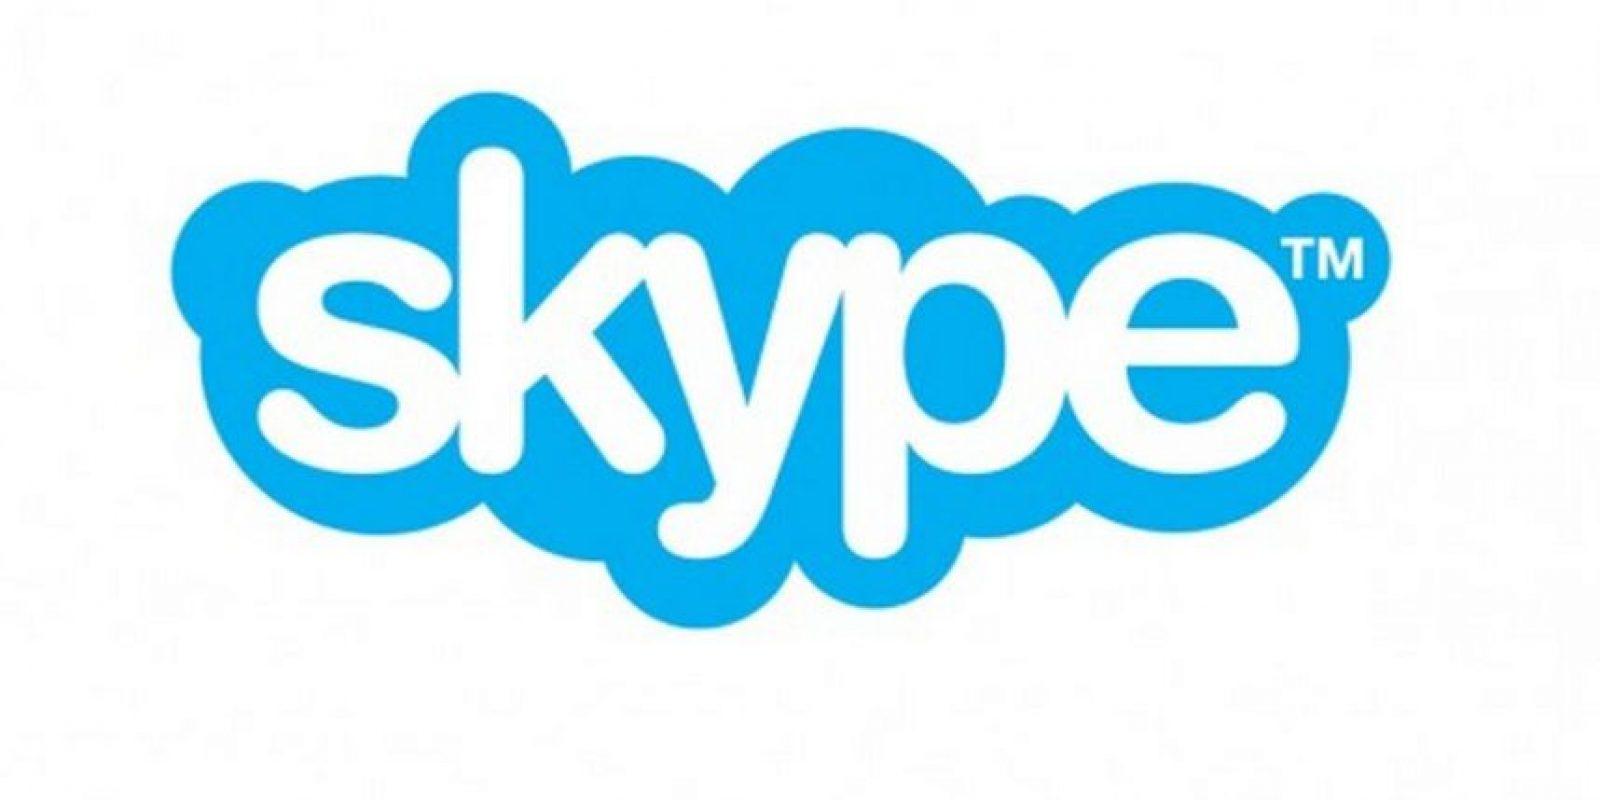 Skype, la plataforma para comunicarse vía voz o texto. Foto:Skype